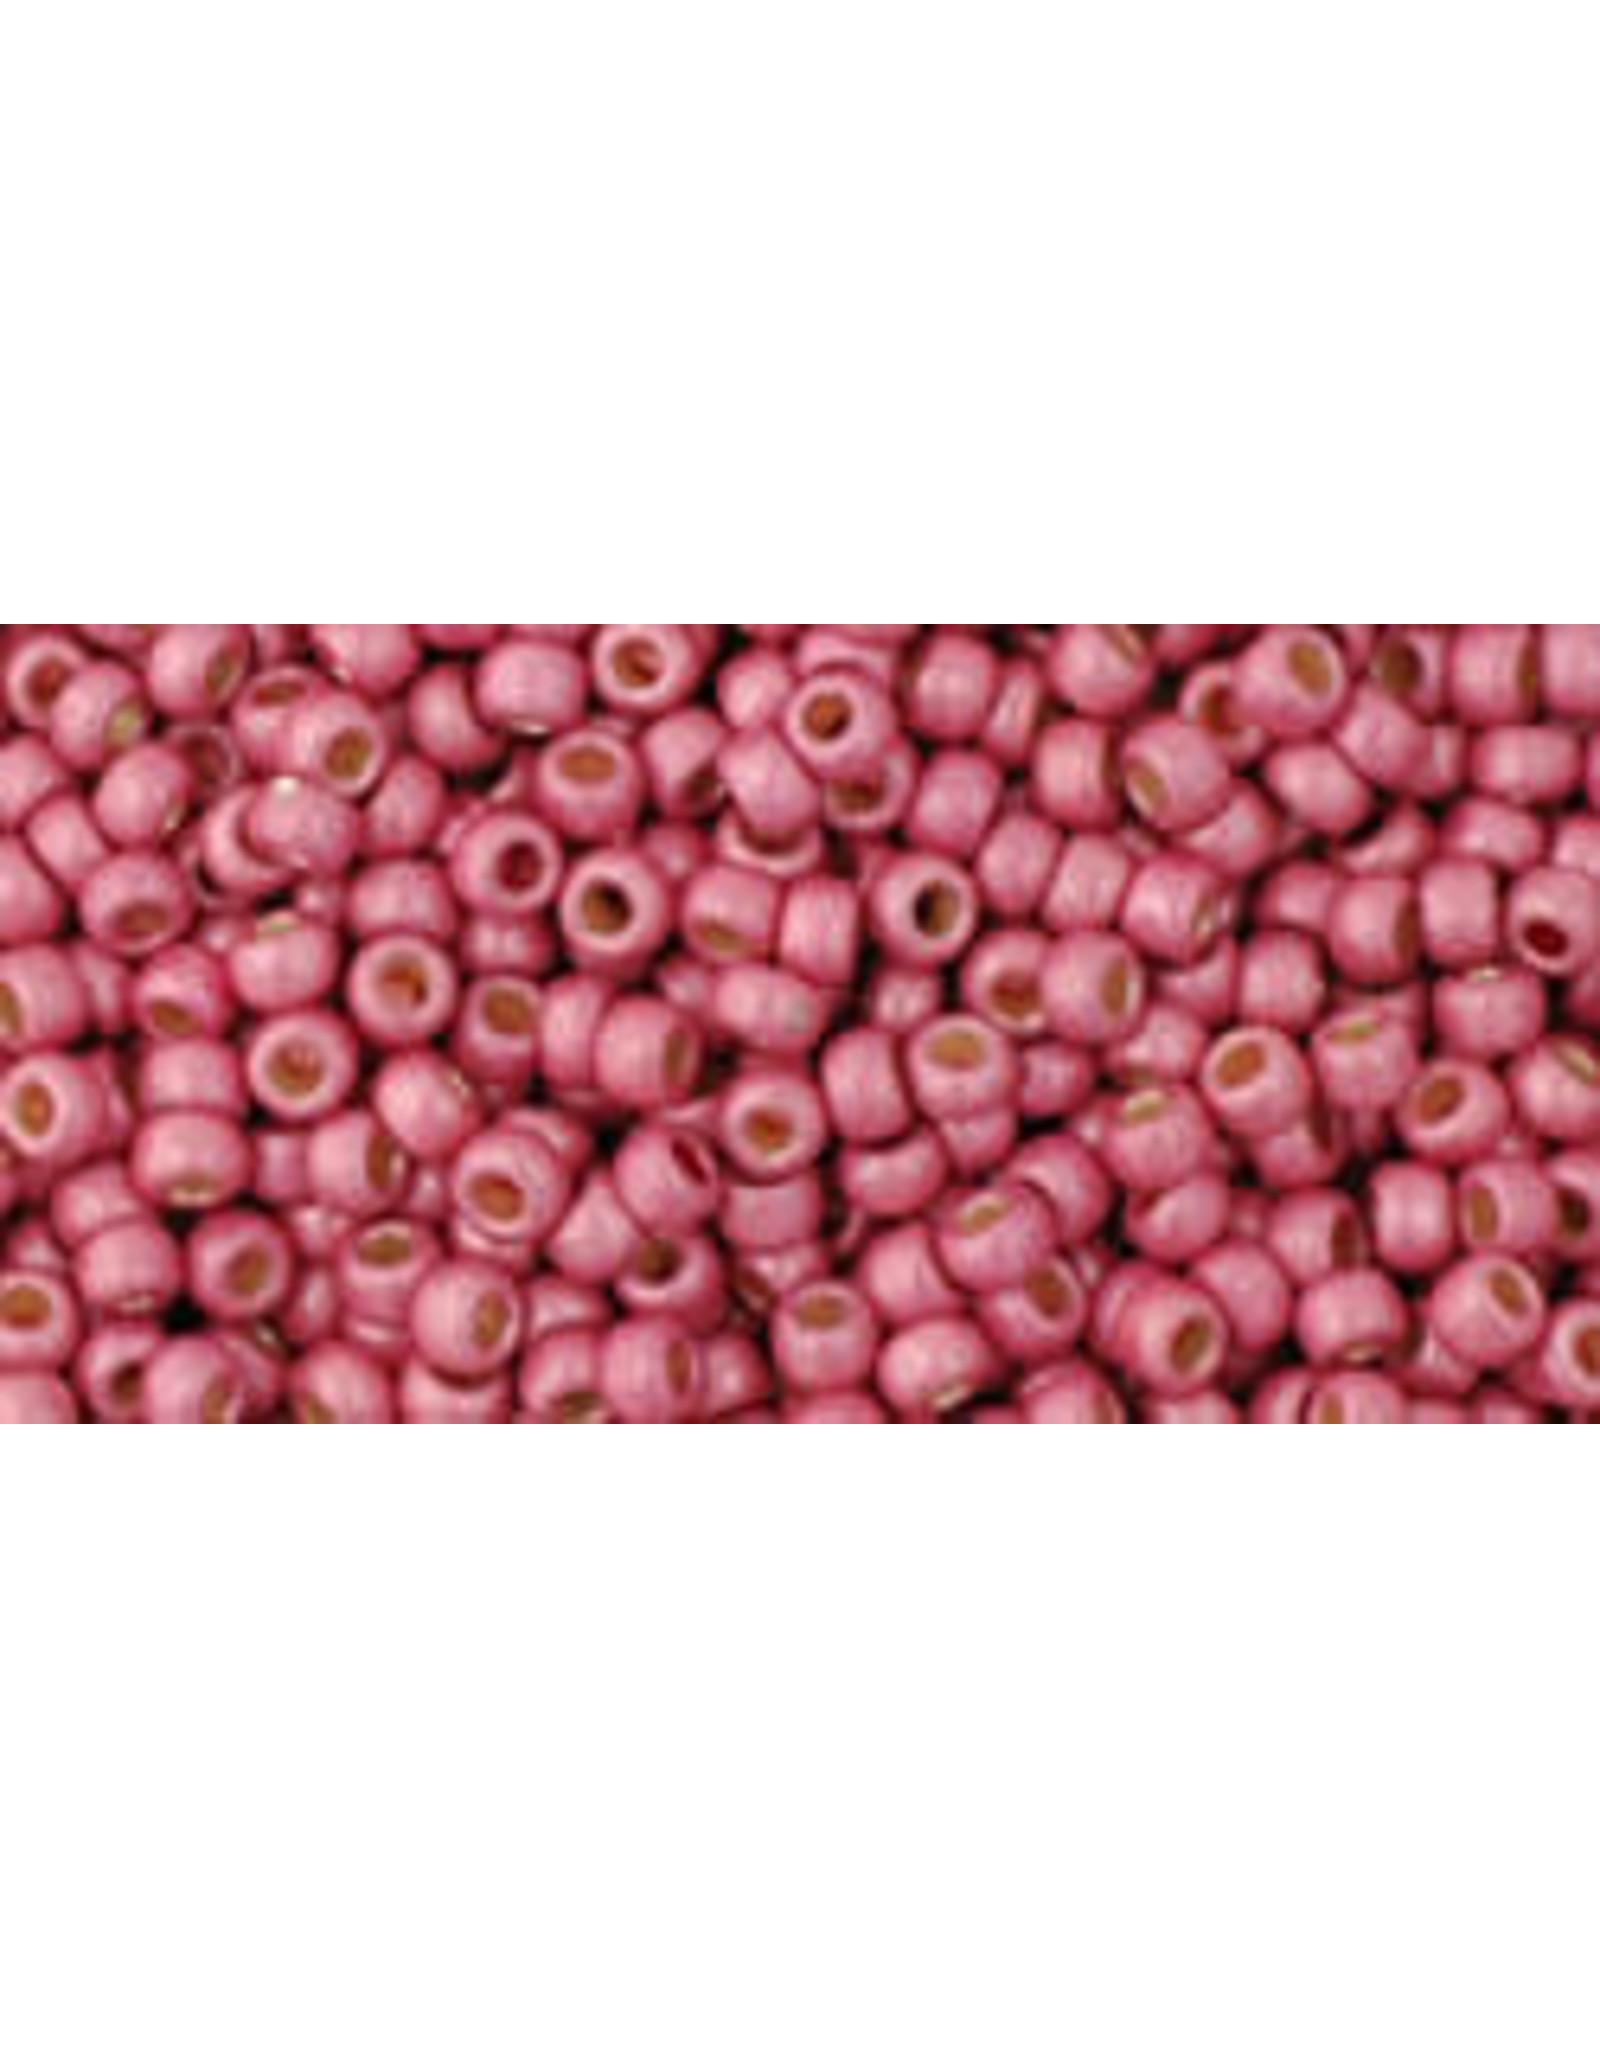 Toho pf563fB 11 Toho Round 40g Pink Metallic Matte